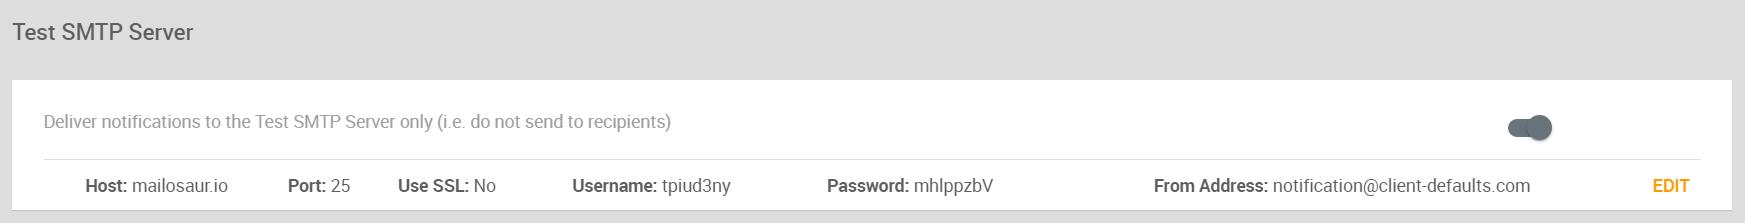 Test SMTP Server section